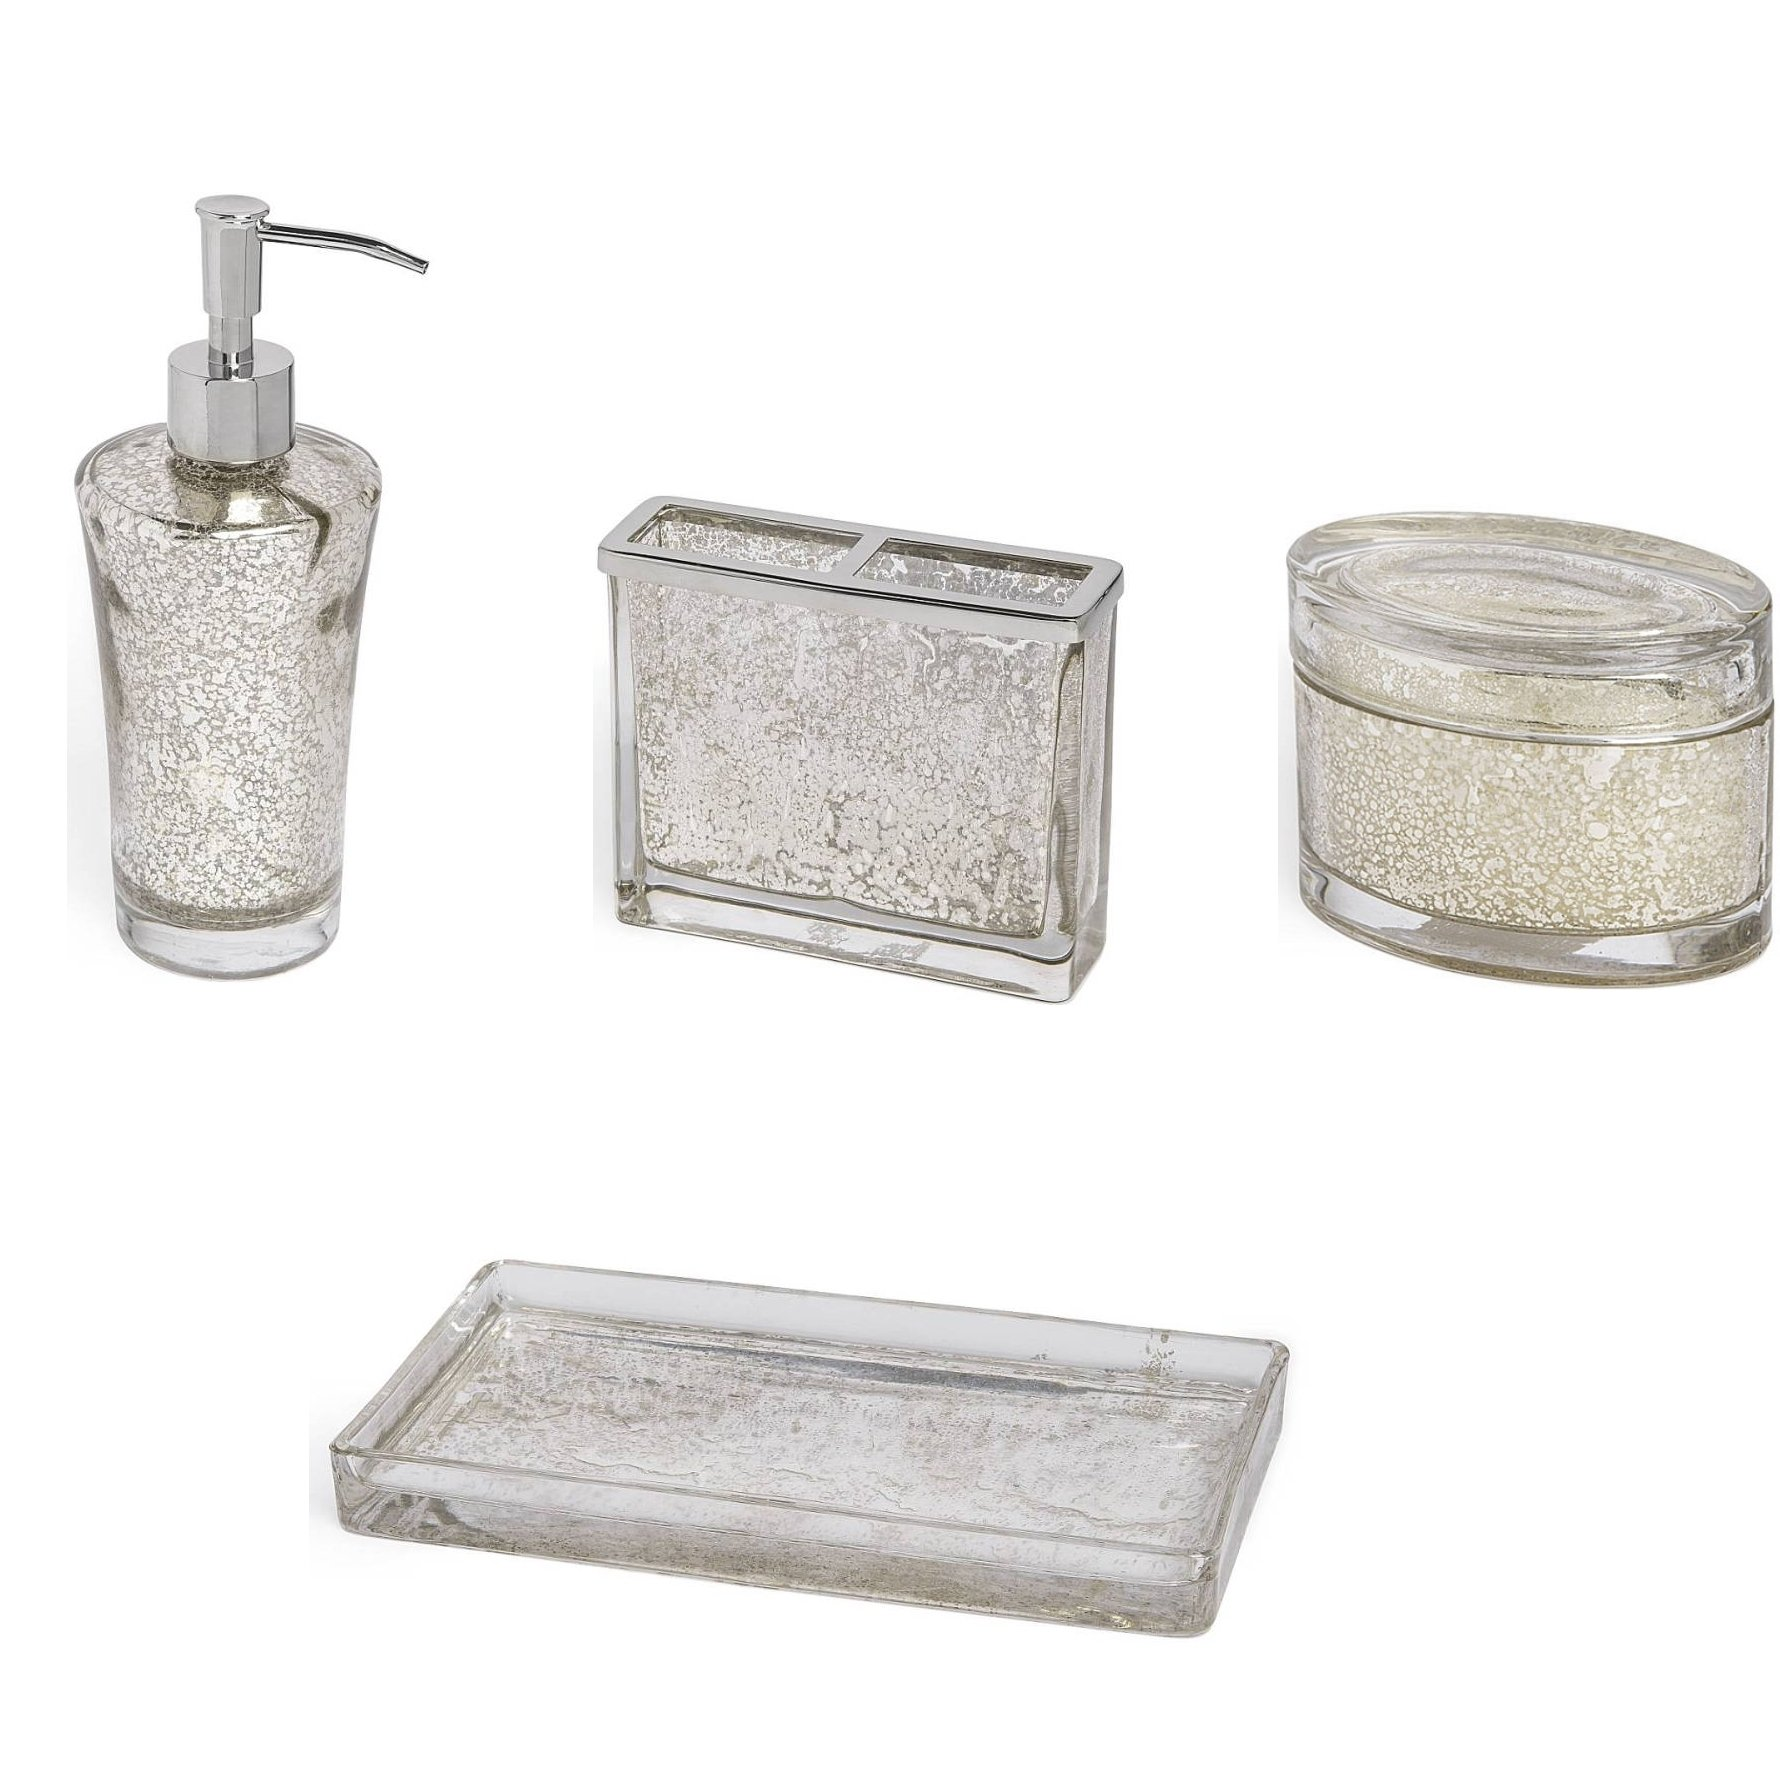 4-Piece Bath Accessory Set by Kassatex, Vizcaya Bath Accessories | Lotion Dispenser, Toothbrush Holder, Tray, Cotton Jar